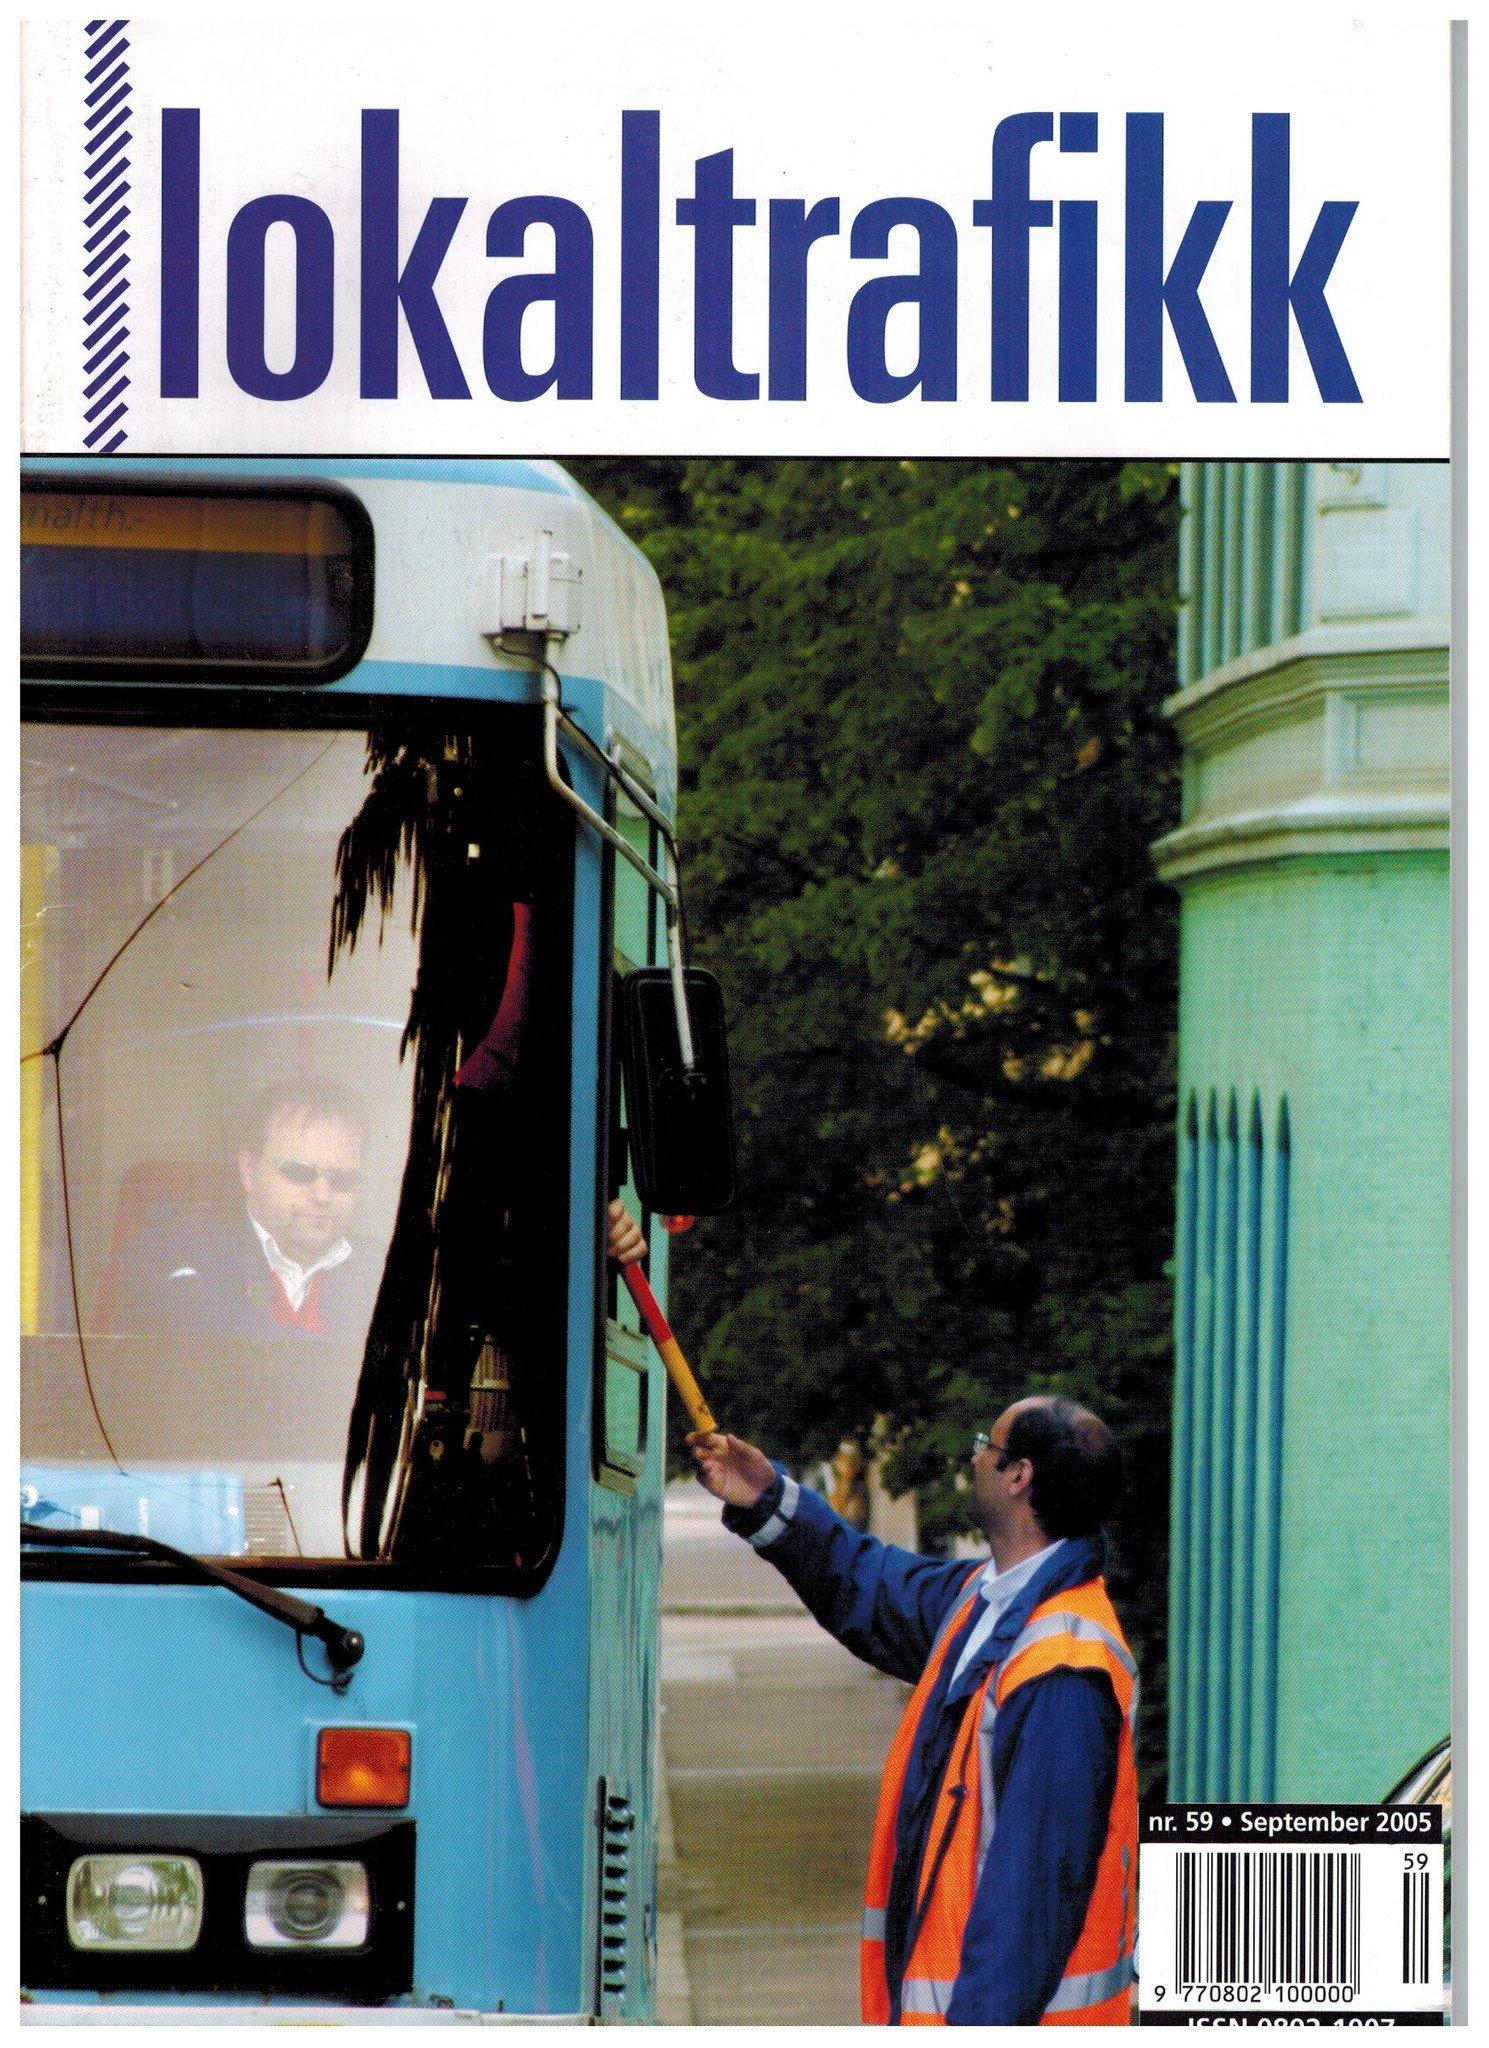 Lokaltrafikk #059